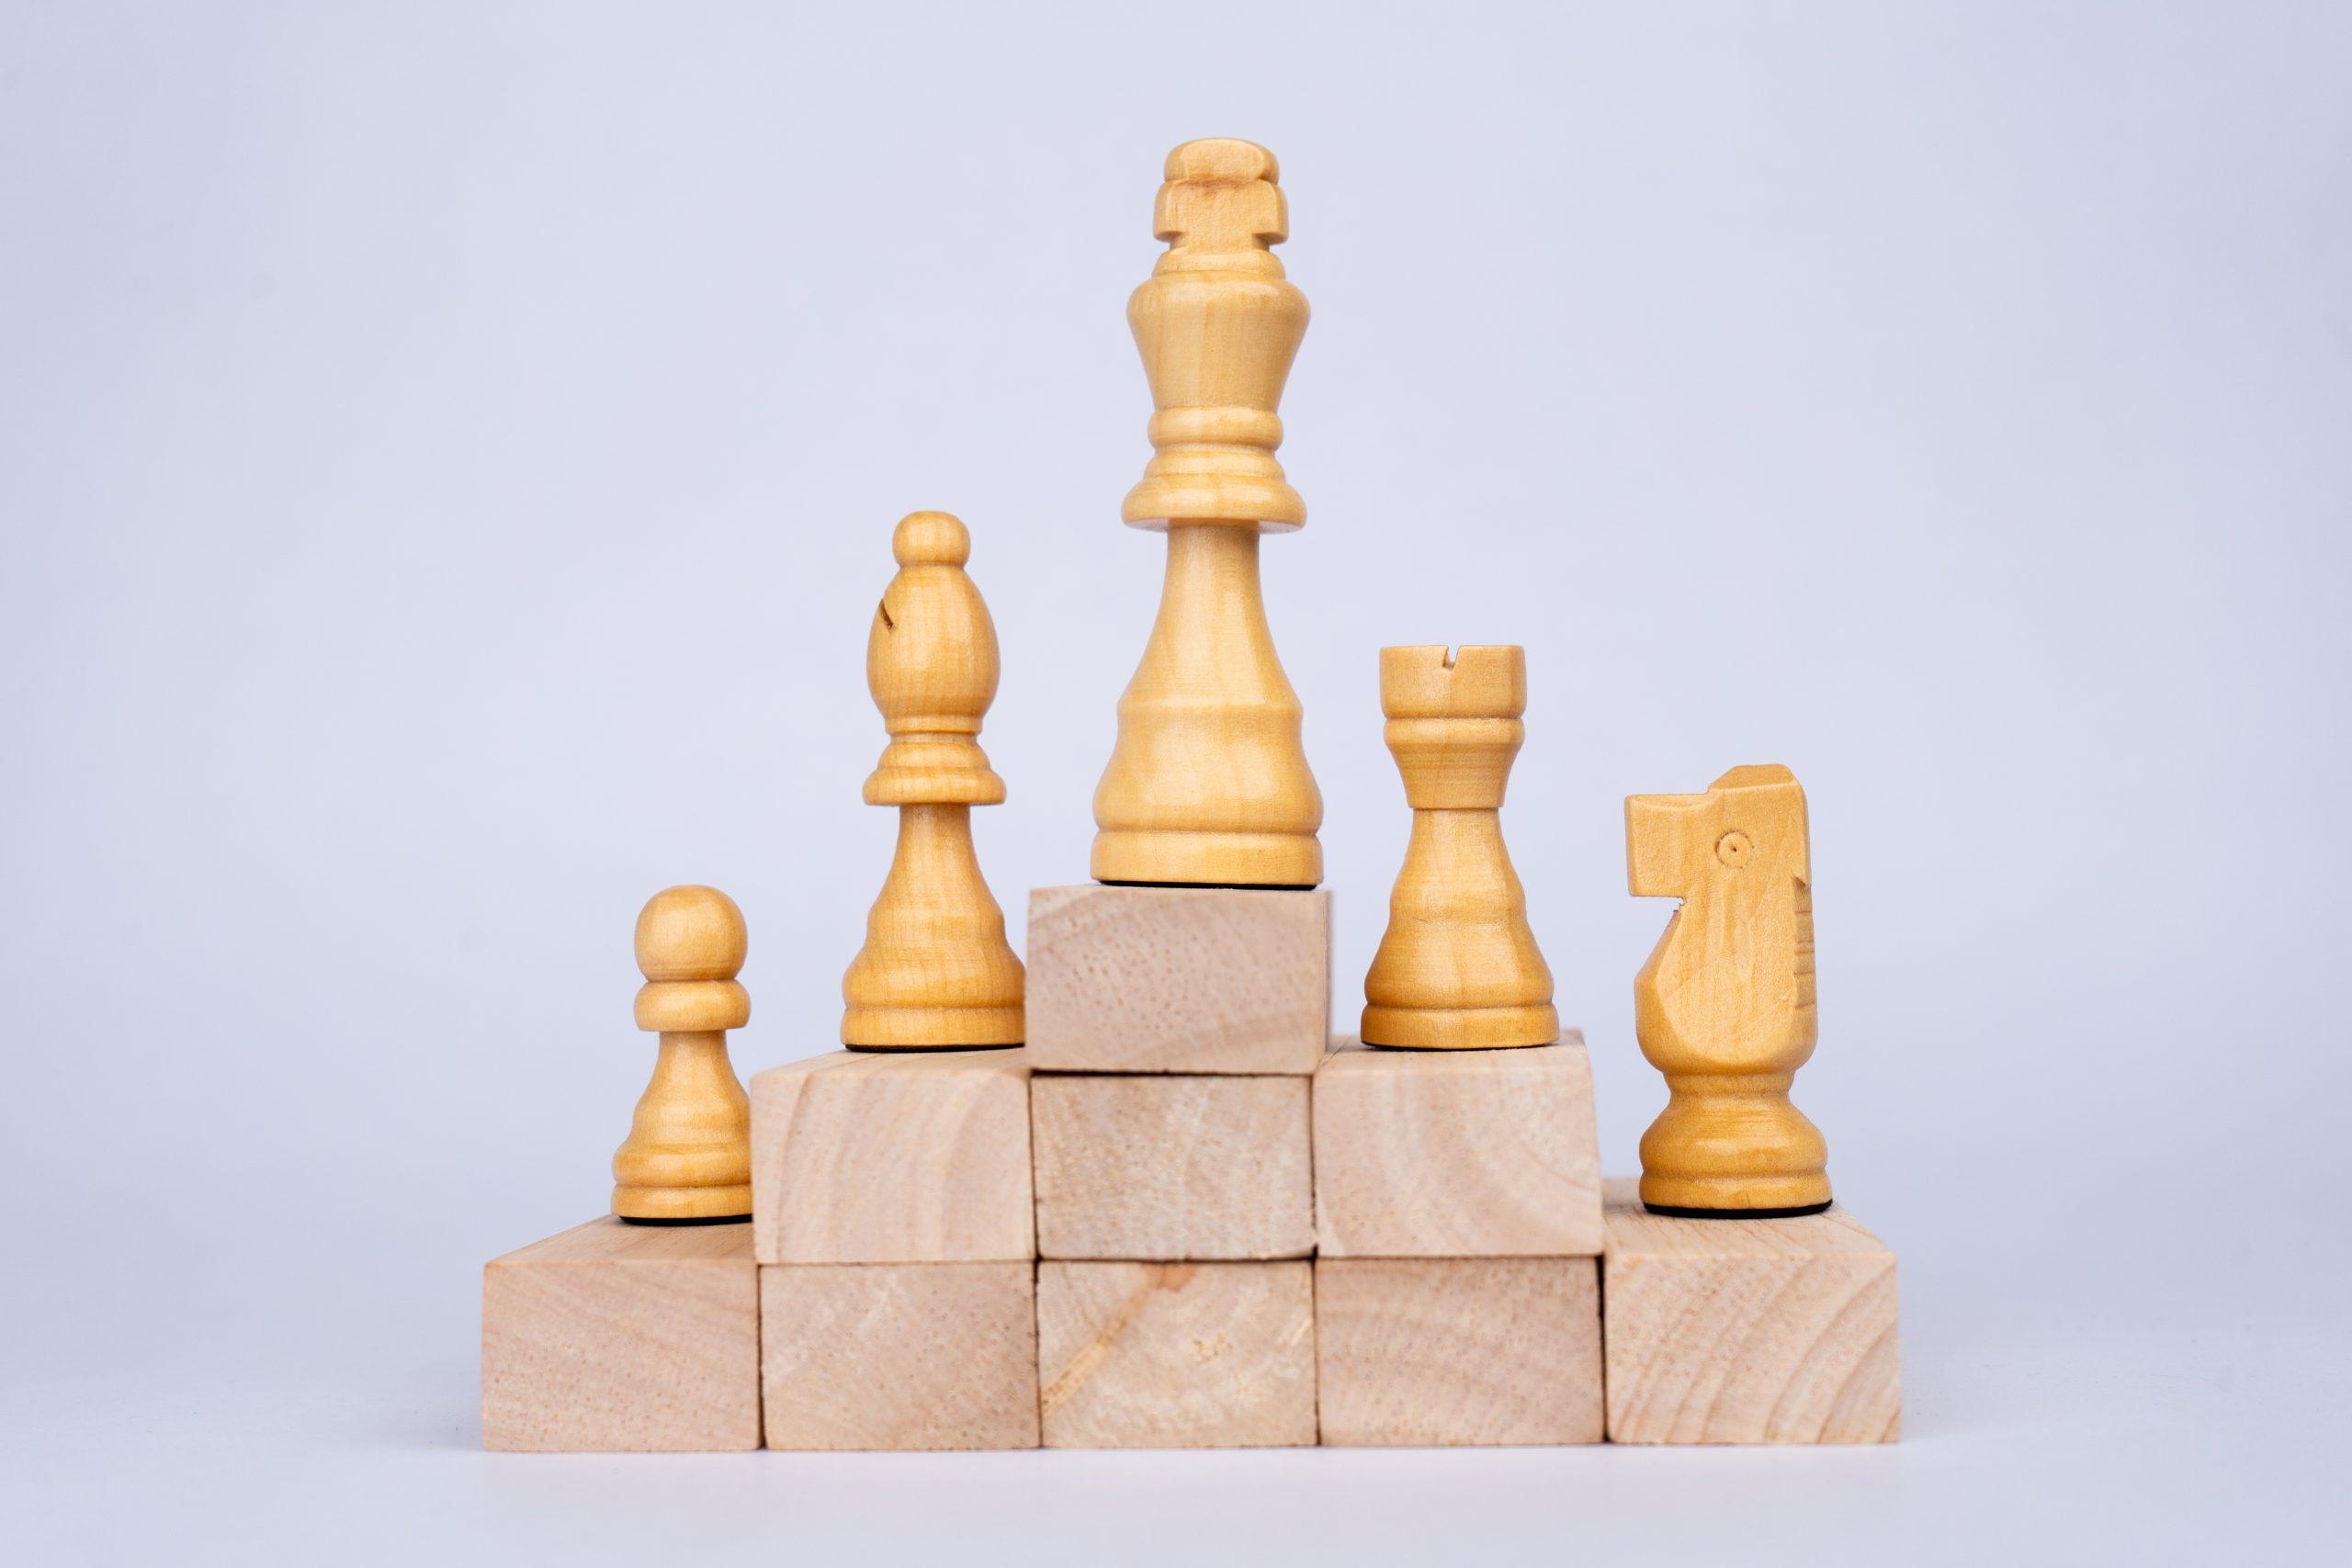 White chess pieces on wooden blocks